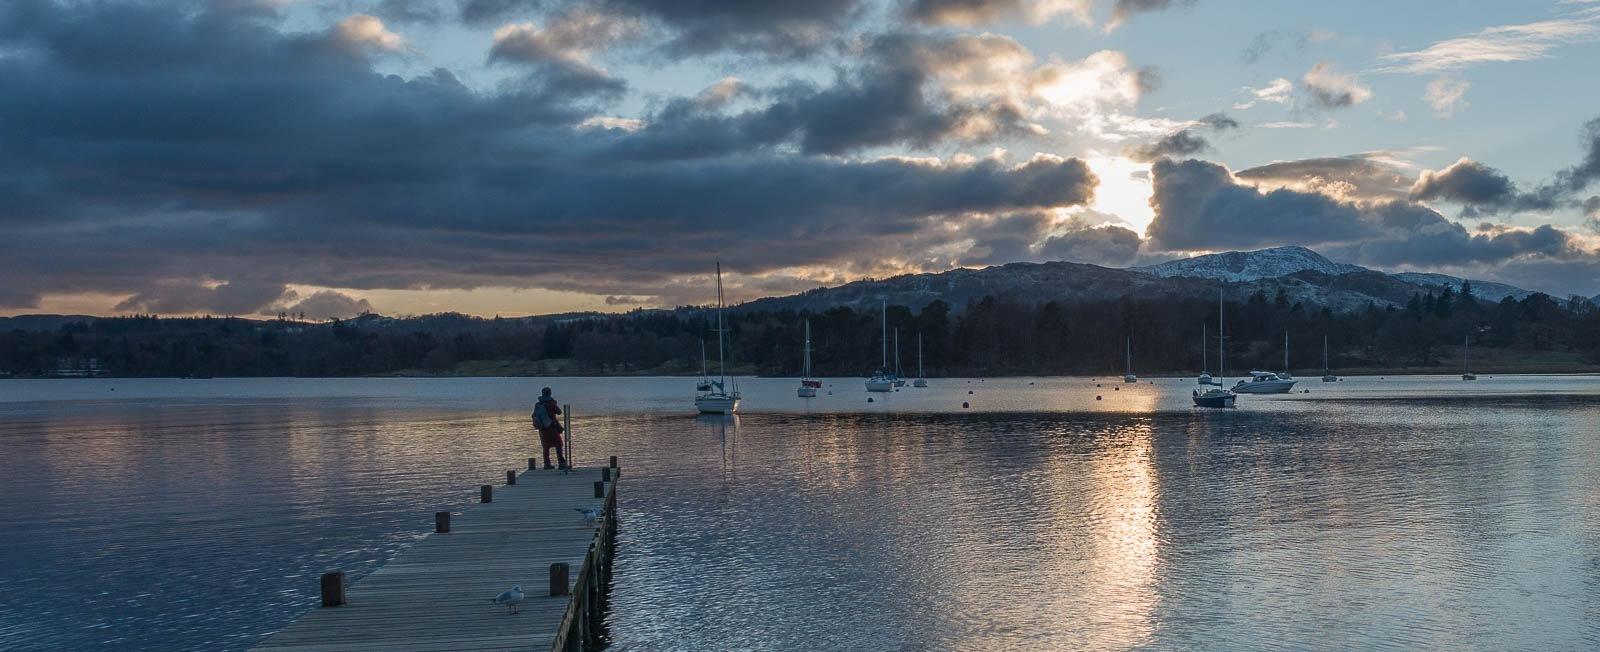 Ambleside Sunset by Chris Wood